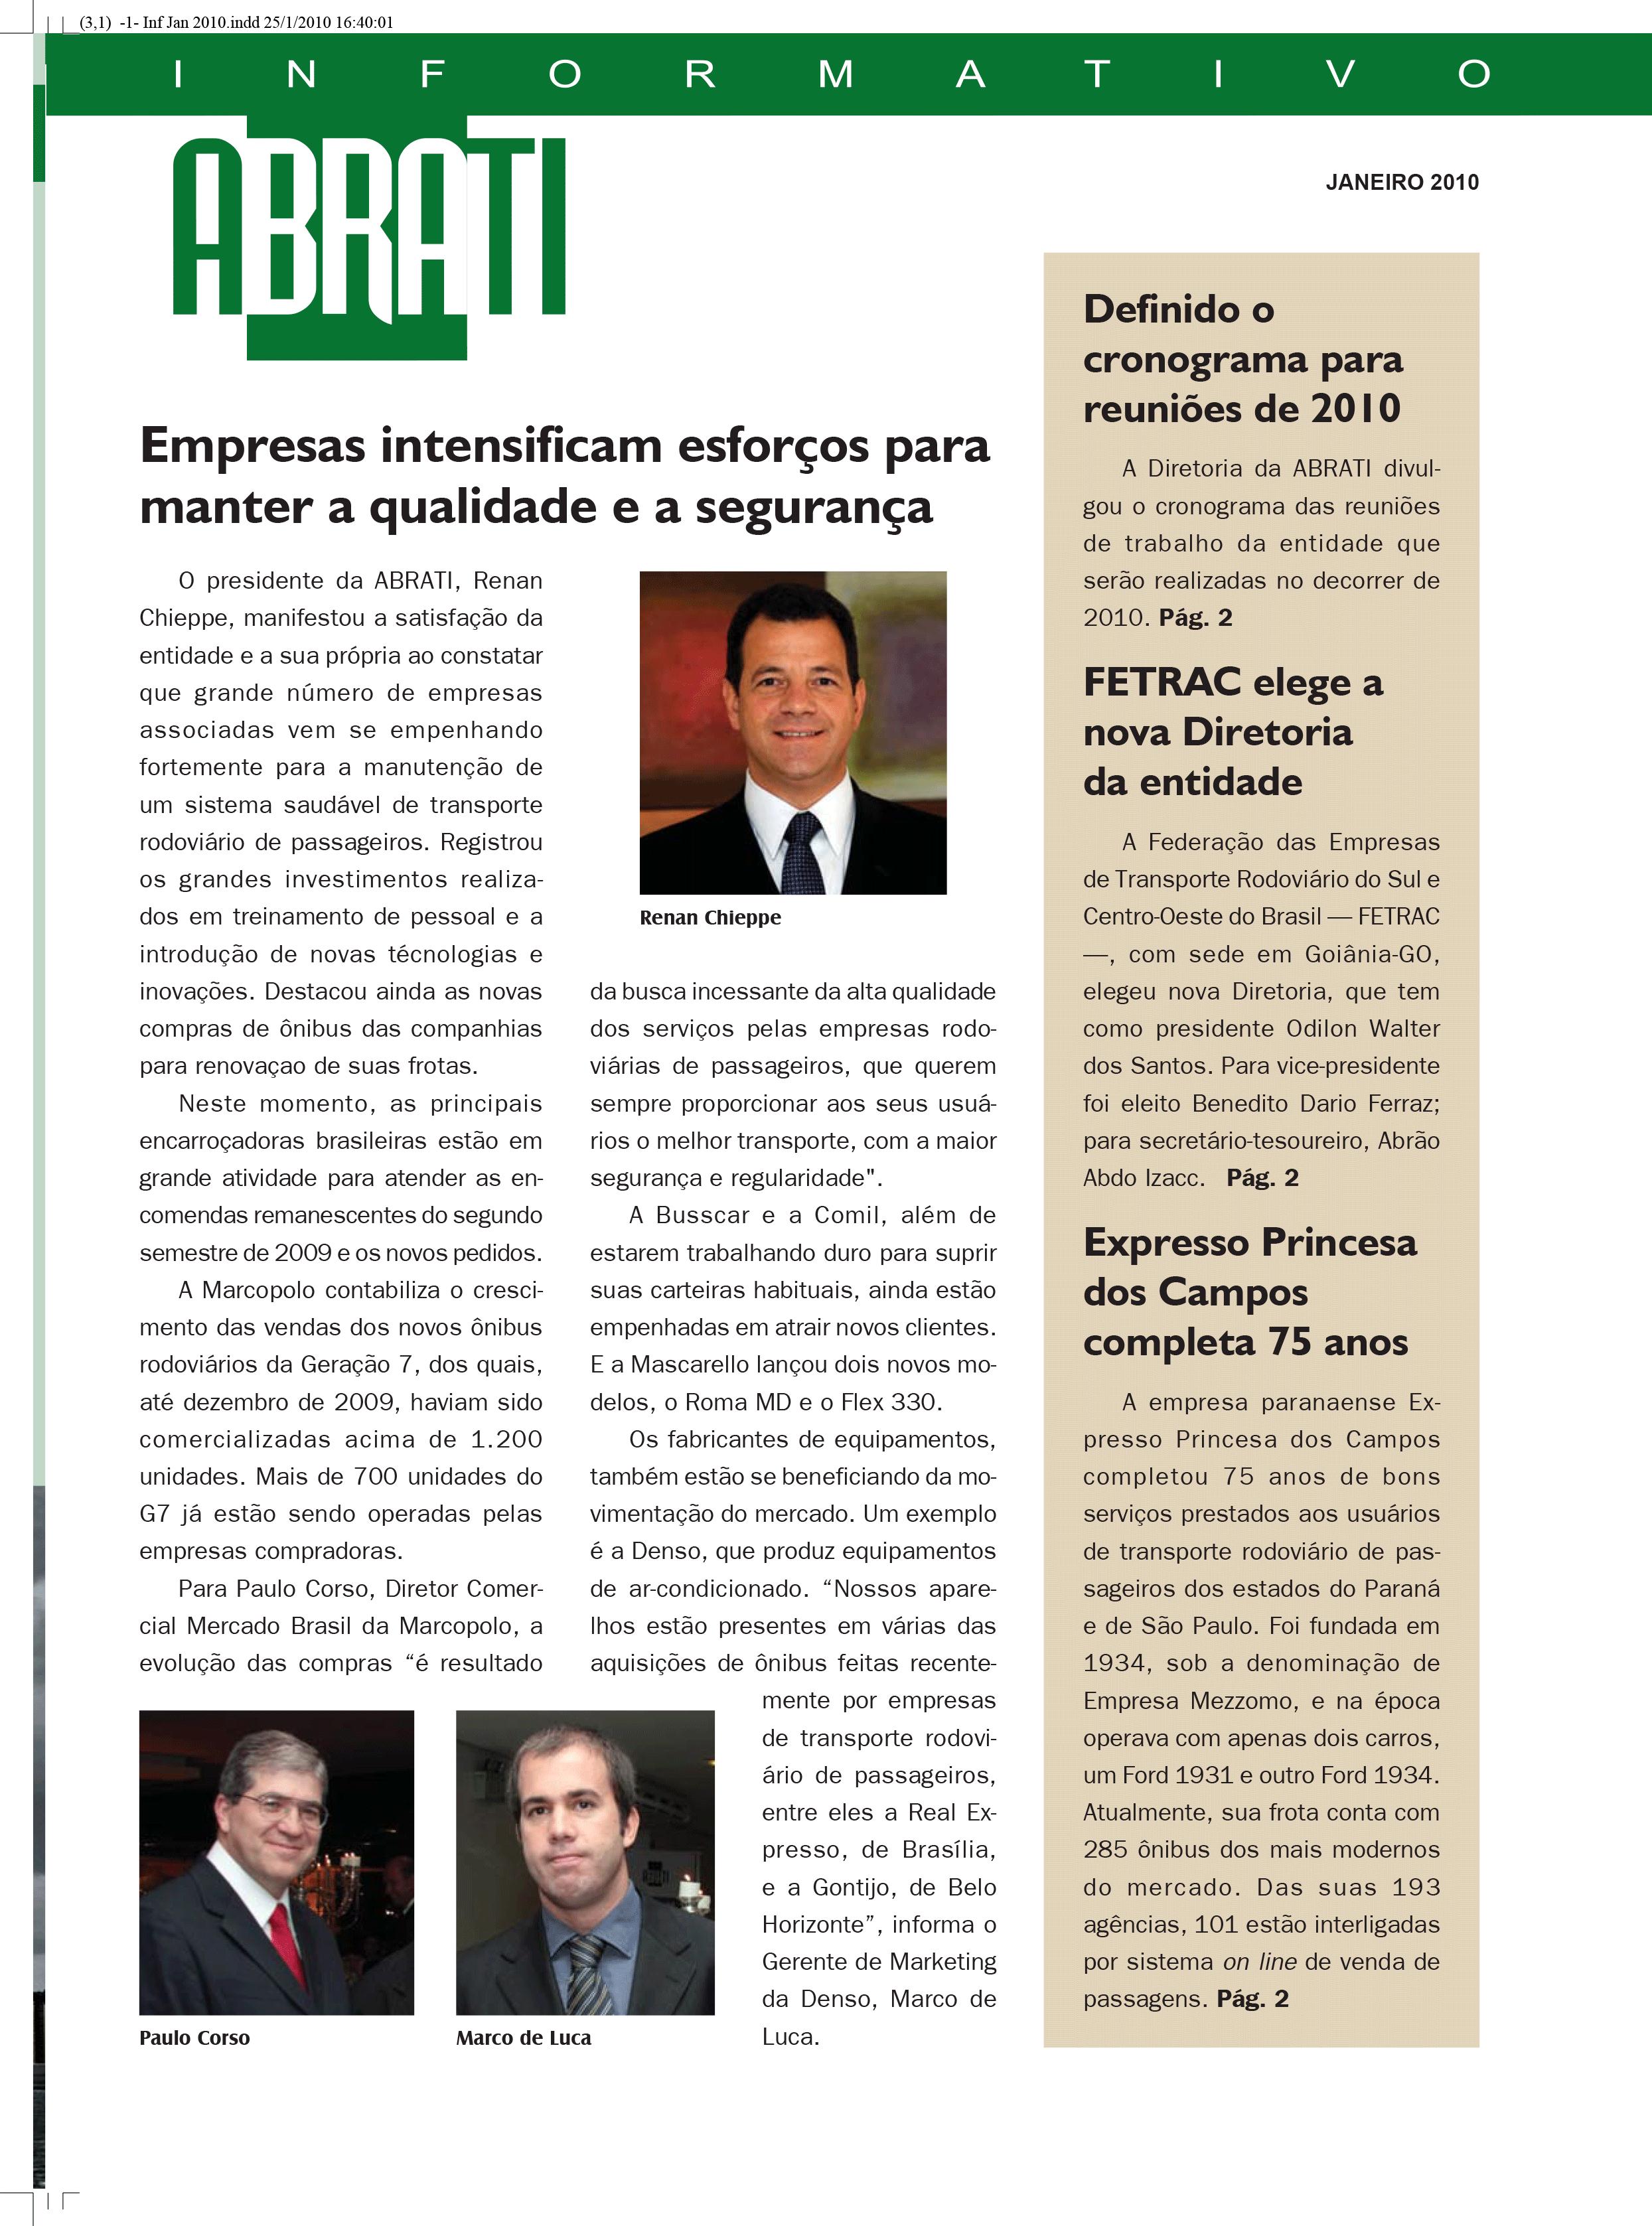 Informativo Janeiro 2010